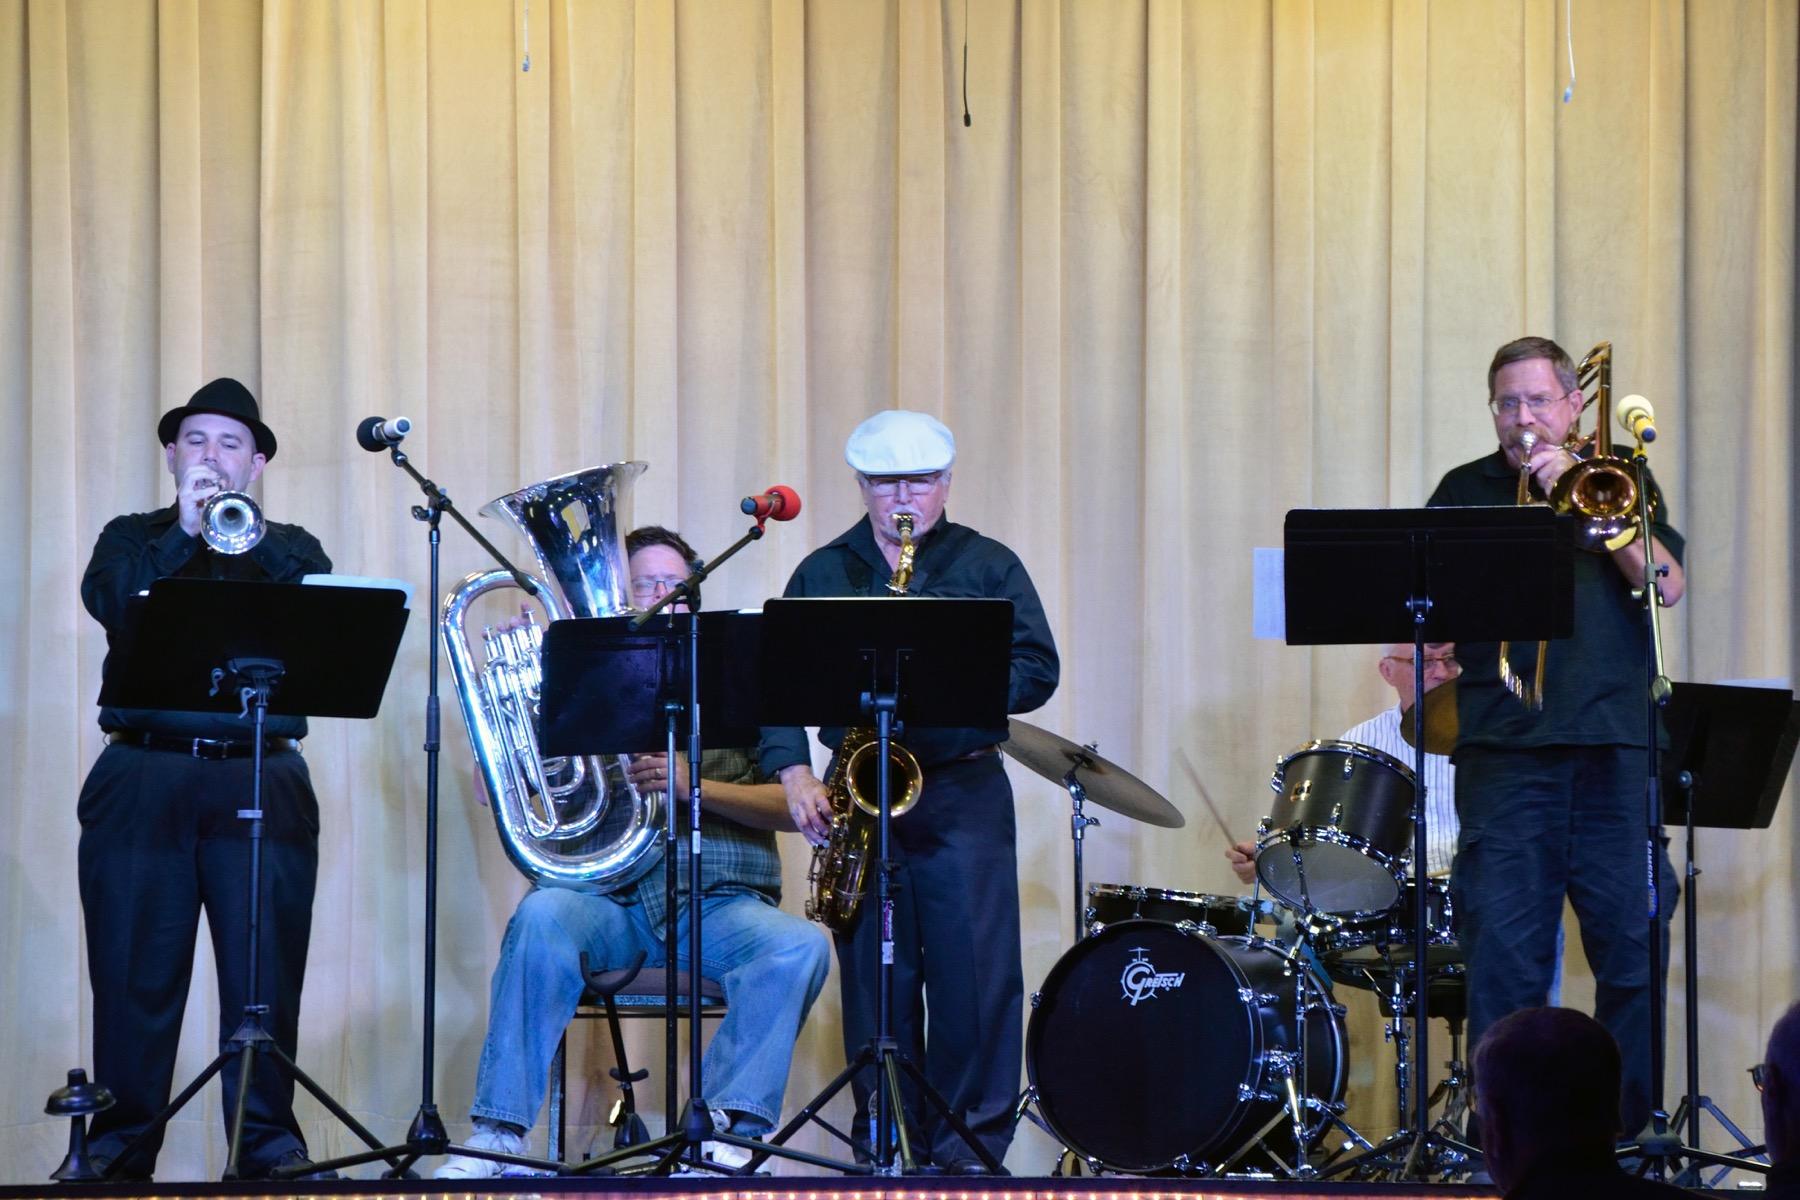 035-Dixie Land Band Entertainment